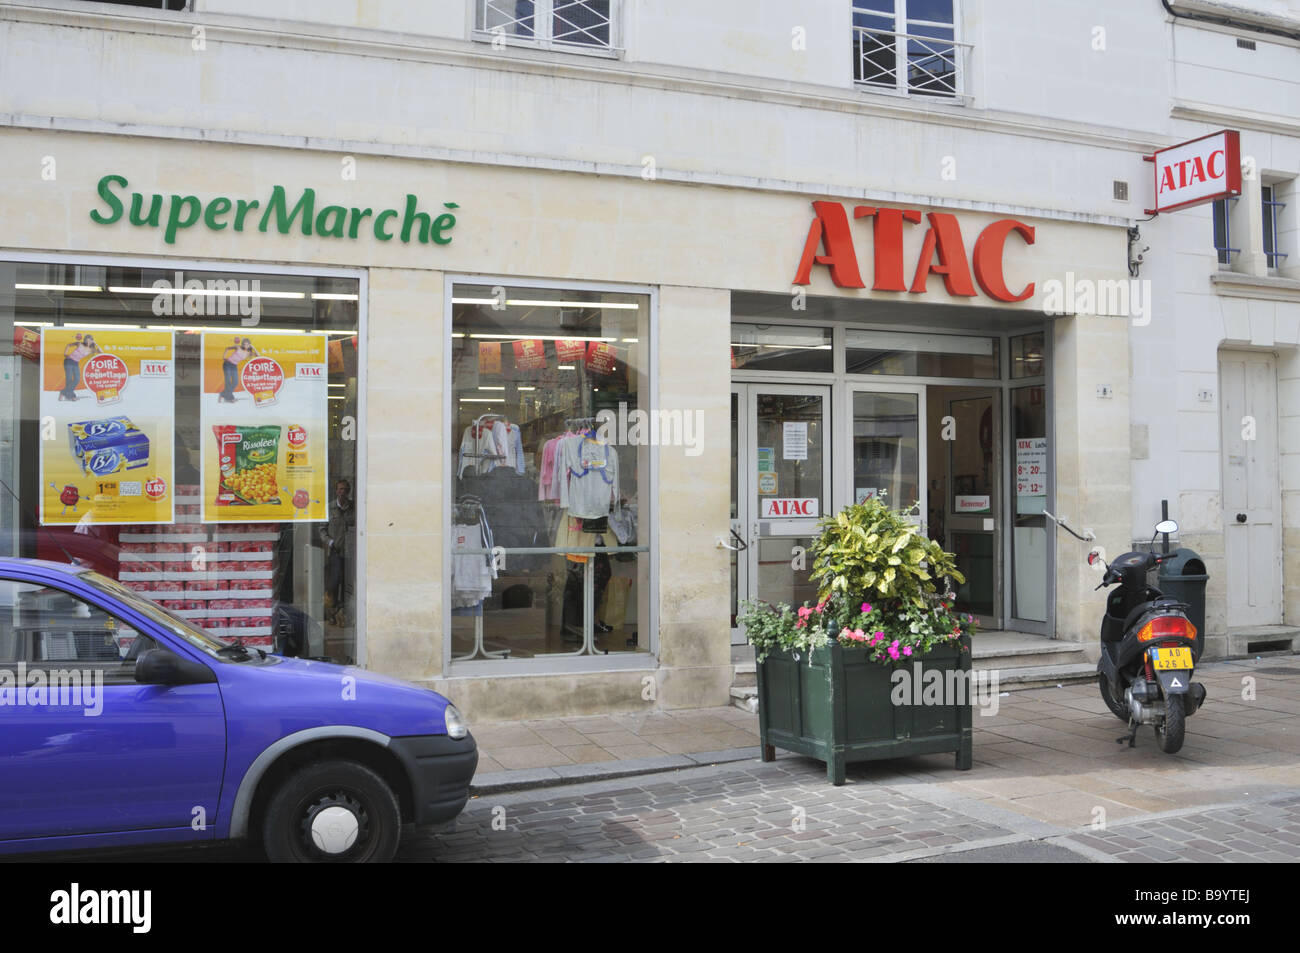 Francese supermercato ATAC Immagini Stock